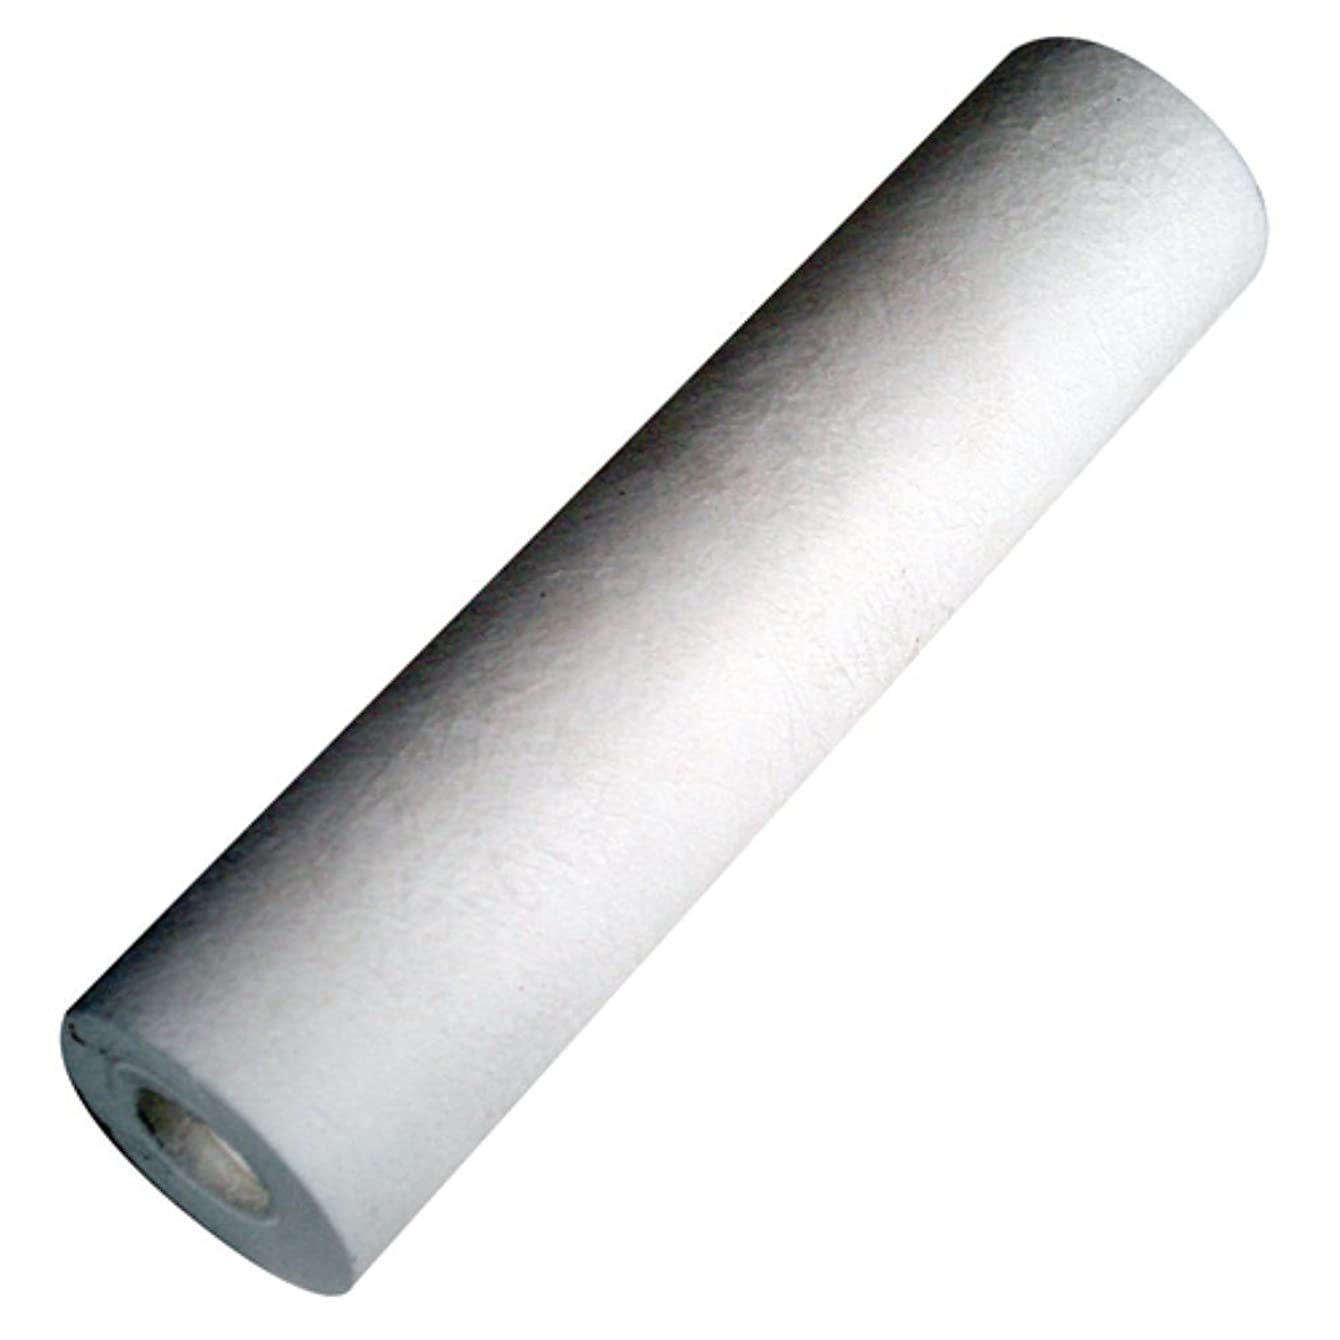 Hydro-Logic 22105 10-Inch by 2.5-Inch Small Boy Sediment Filter cokefdrvlryhe16